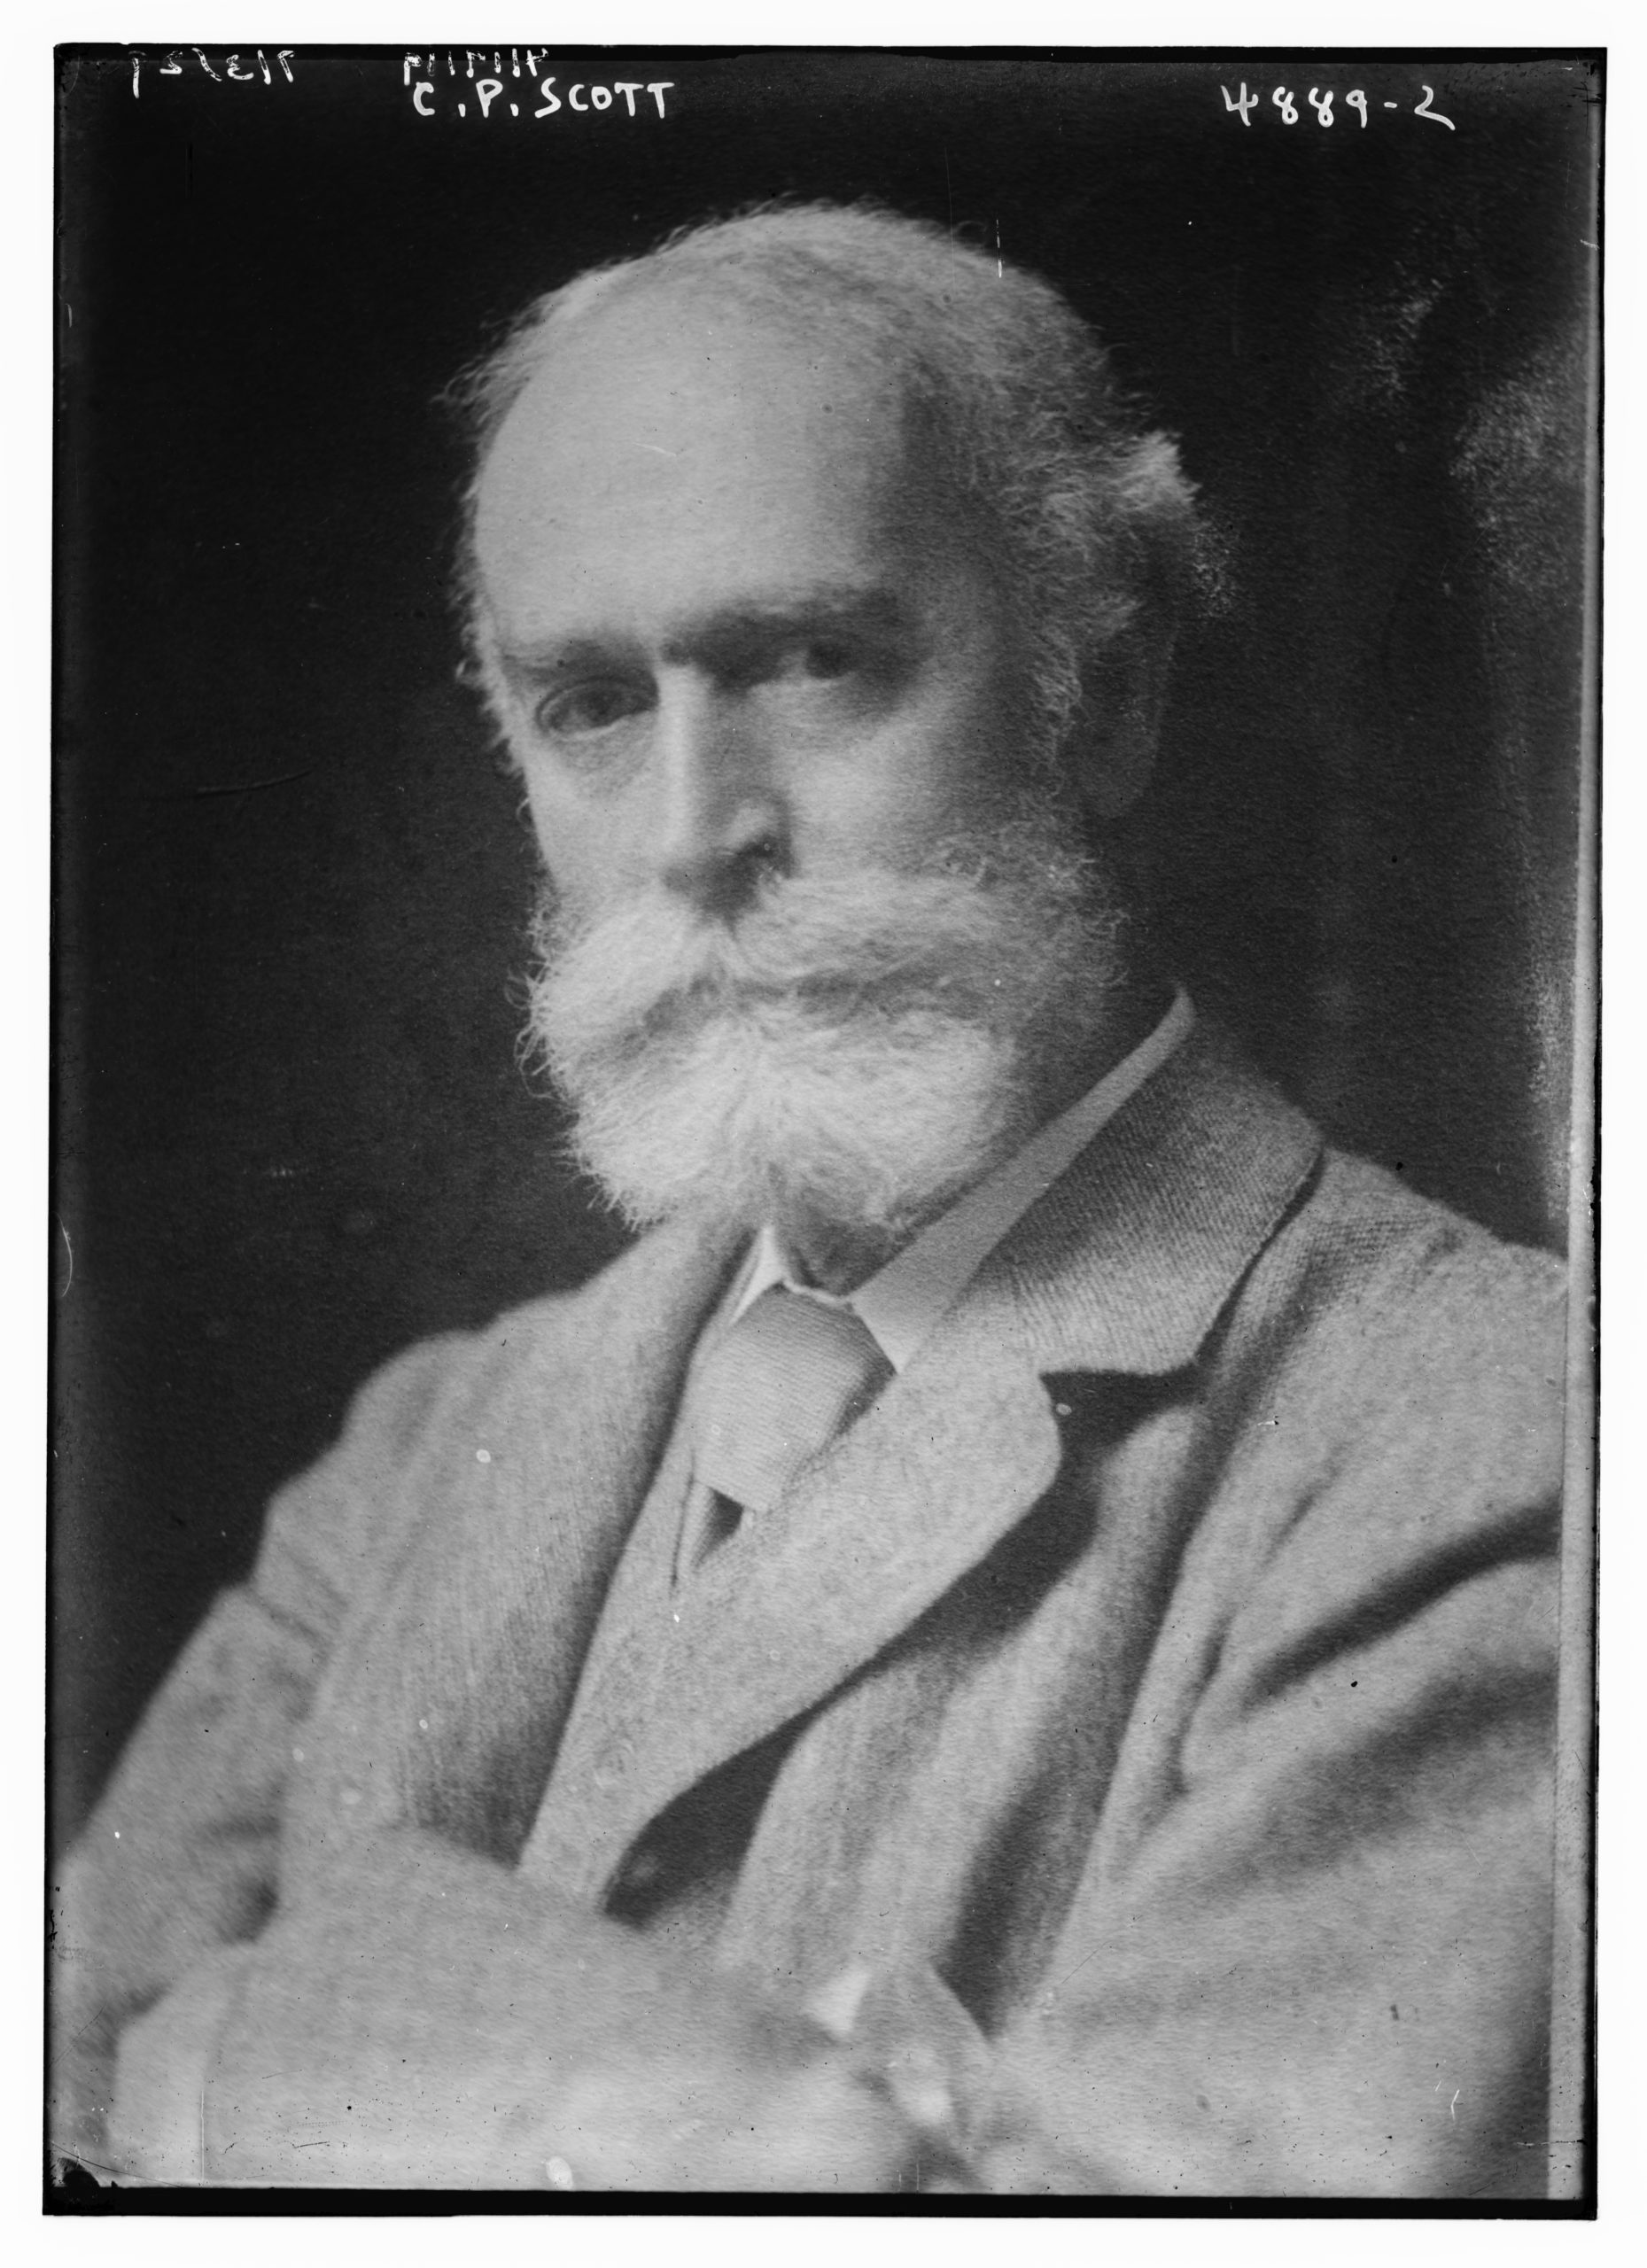 Charles_Prestwich_Scott_in_1919.jpg